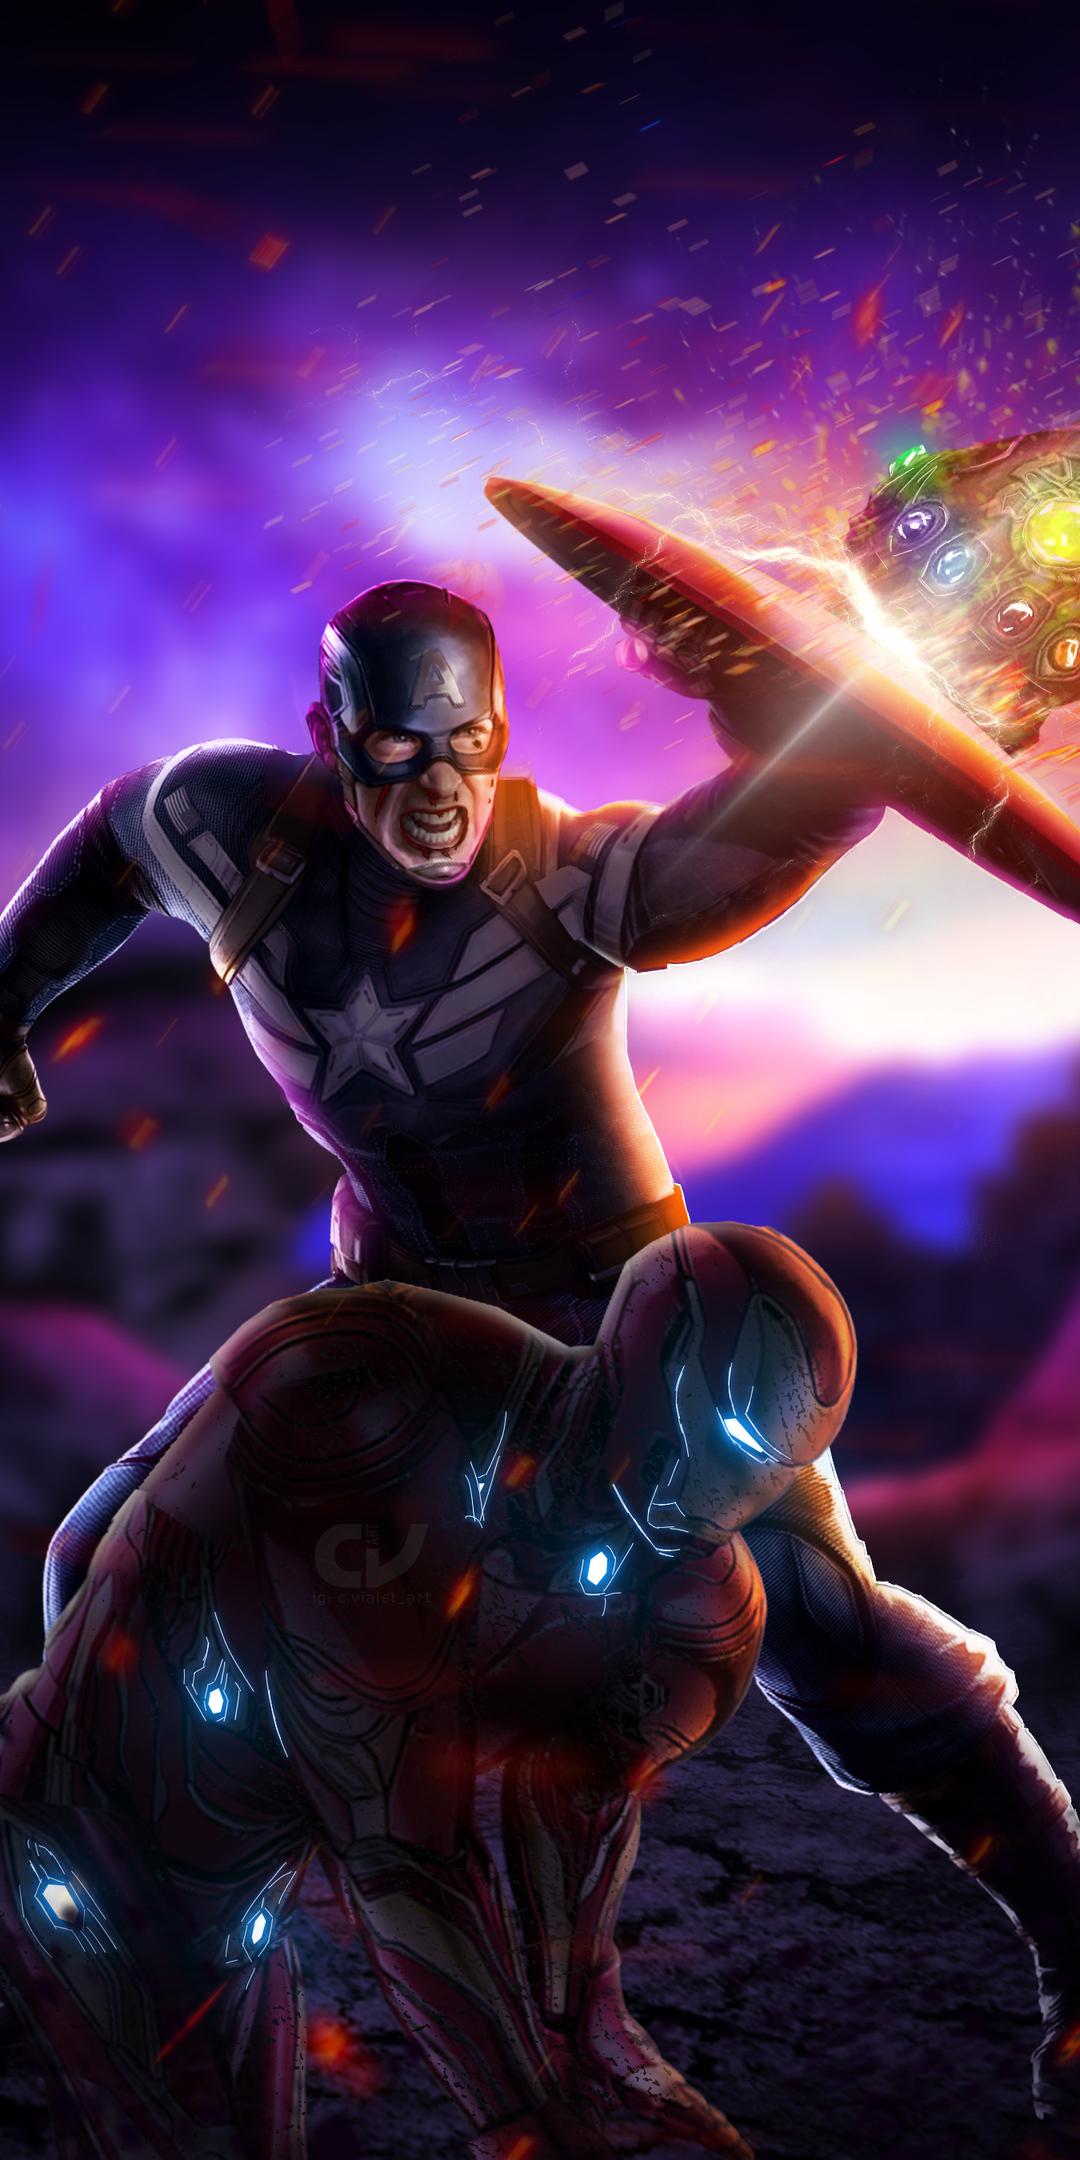 1080x2160 Captain America Avengers Endgame One Plus 5T ...